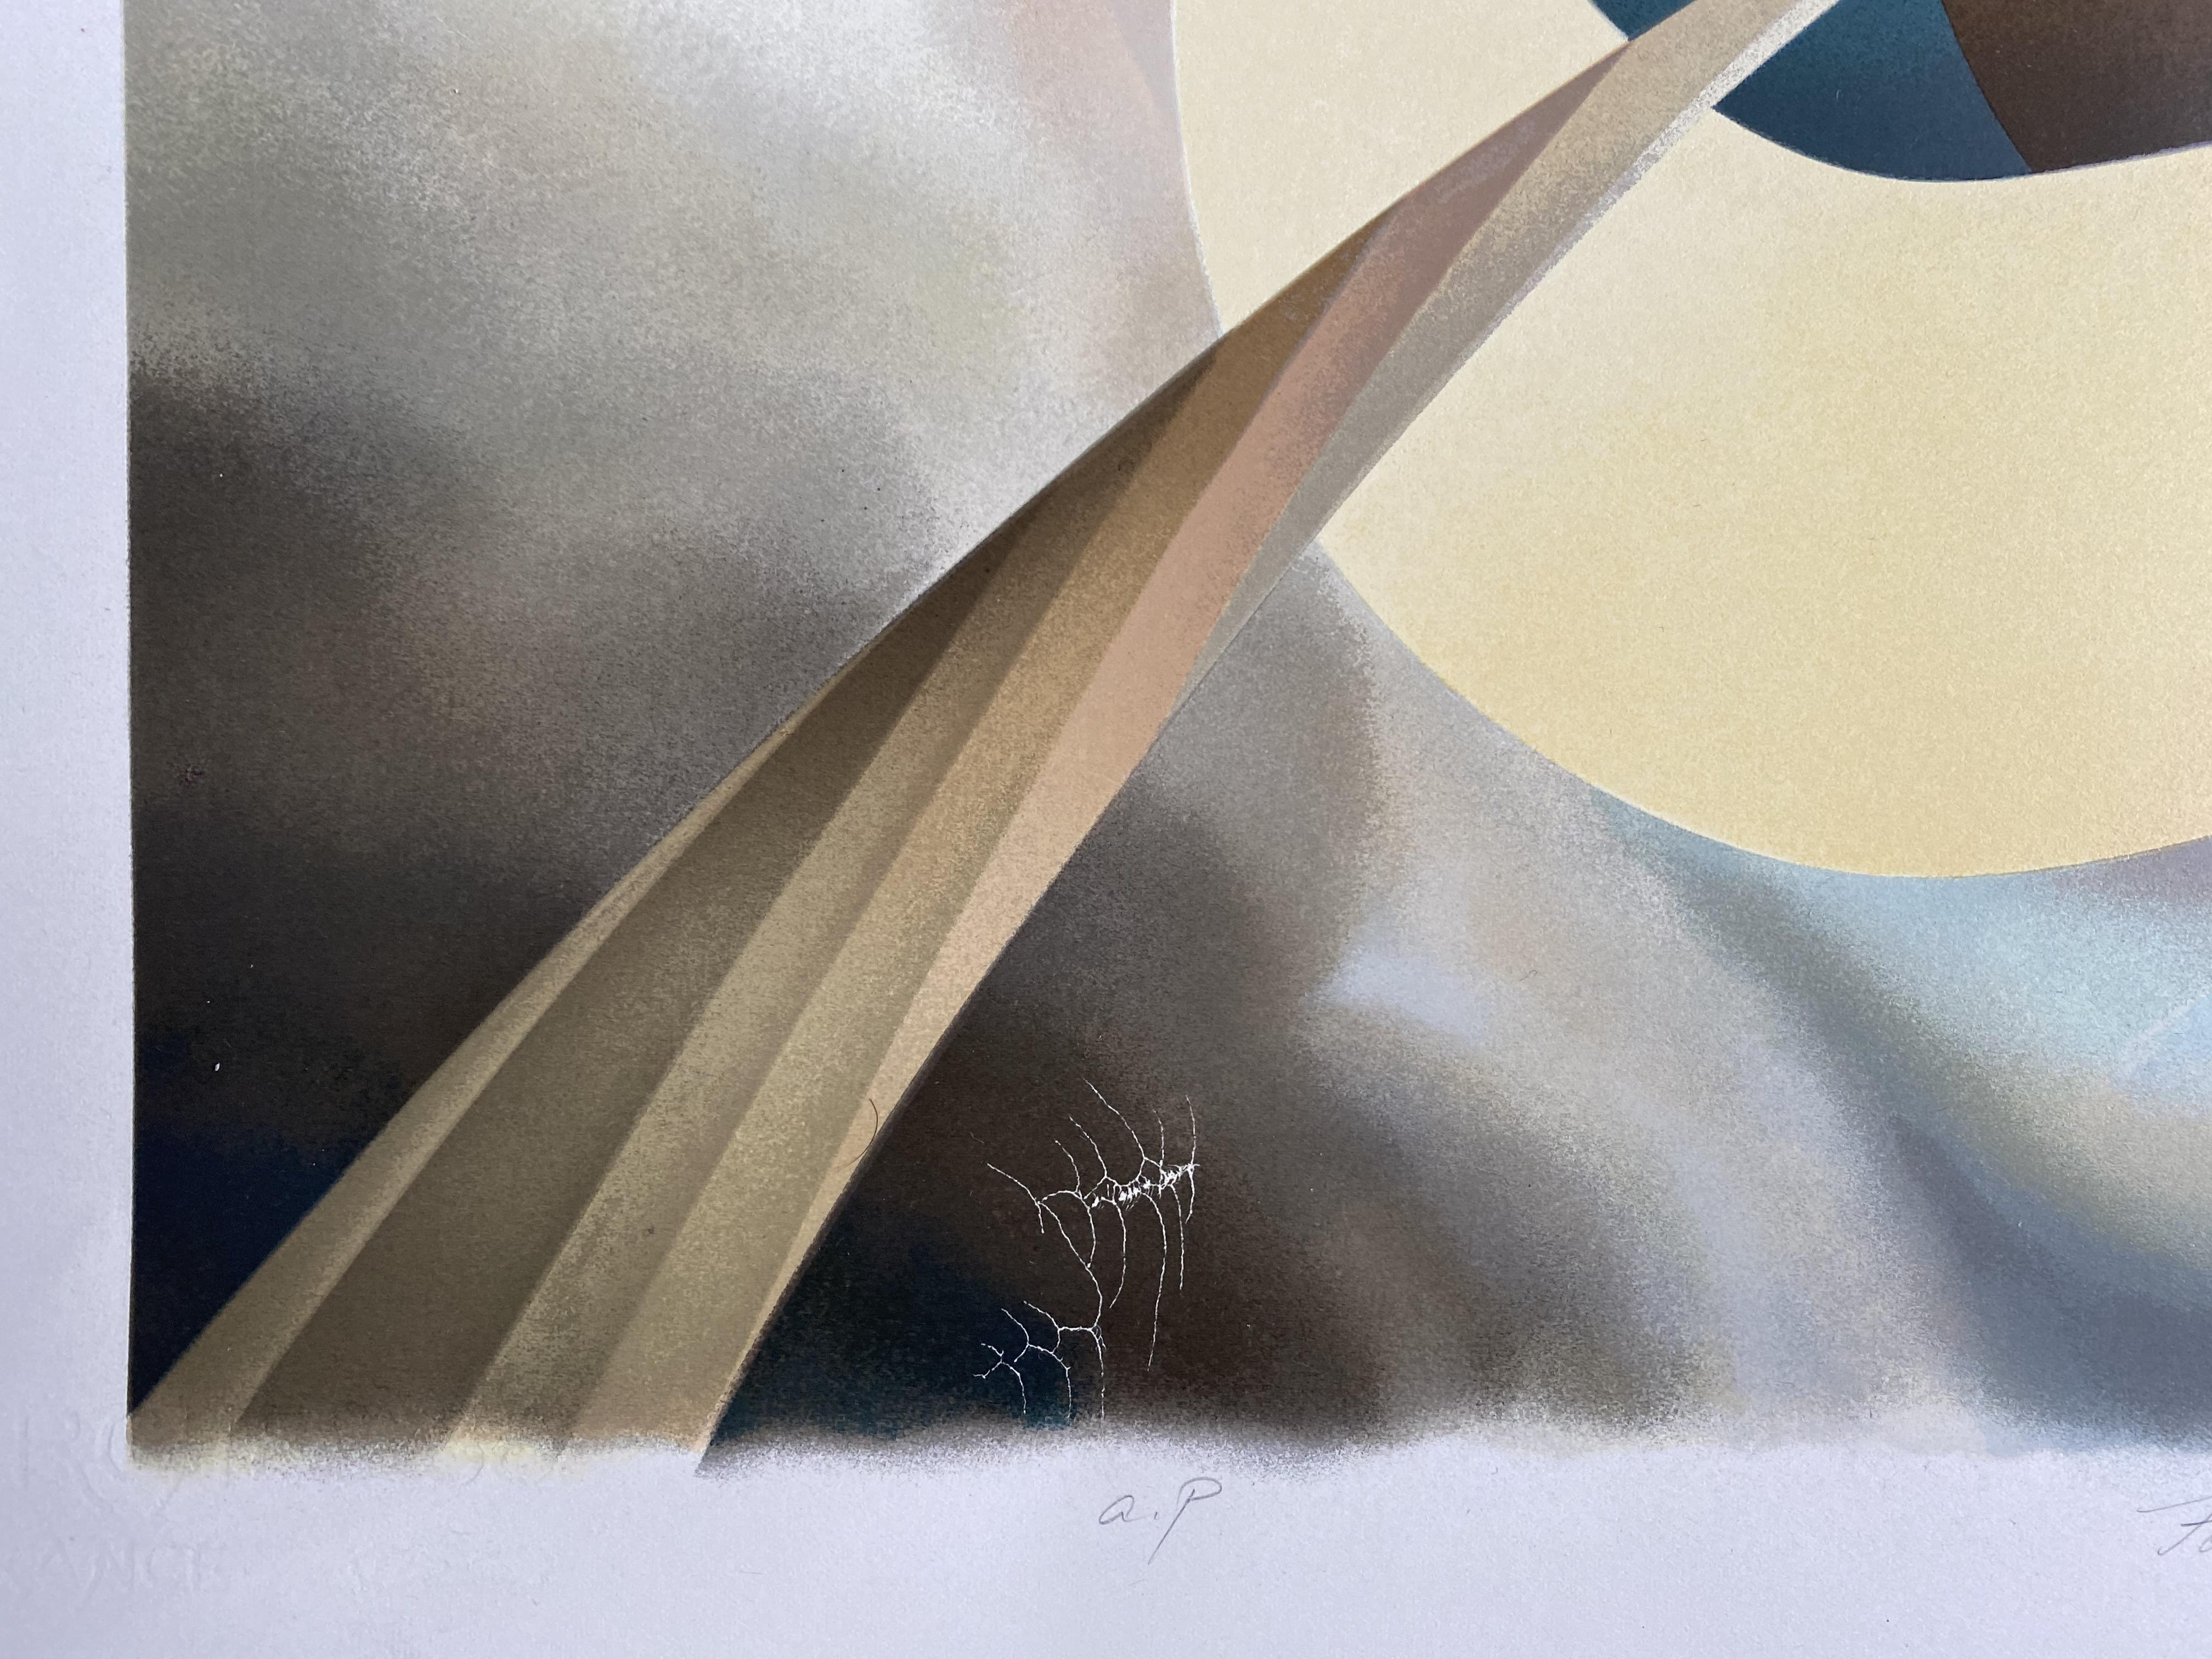 Masaaki Noda (Japanese, b. 1949), silkscreen print - Image 3 of 3